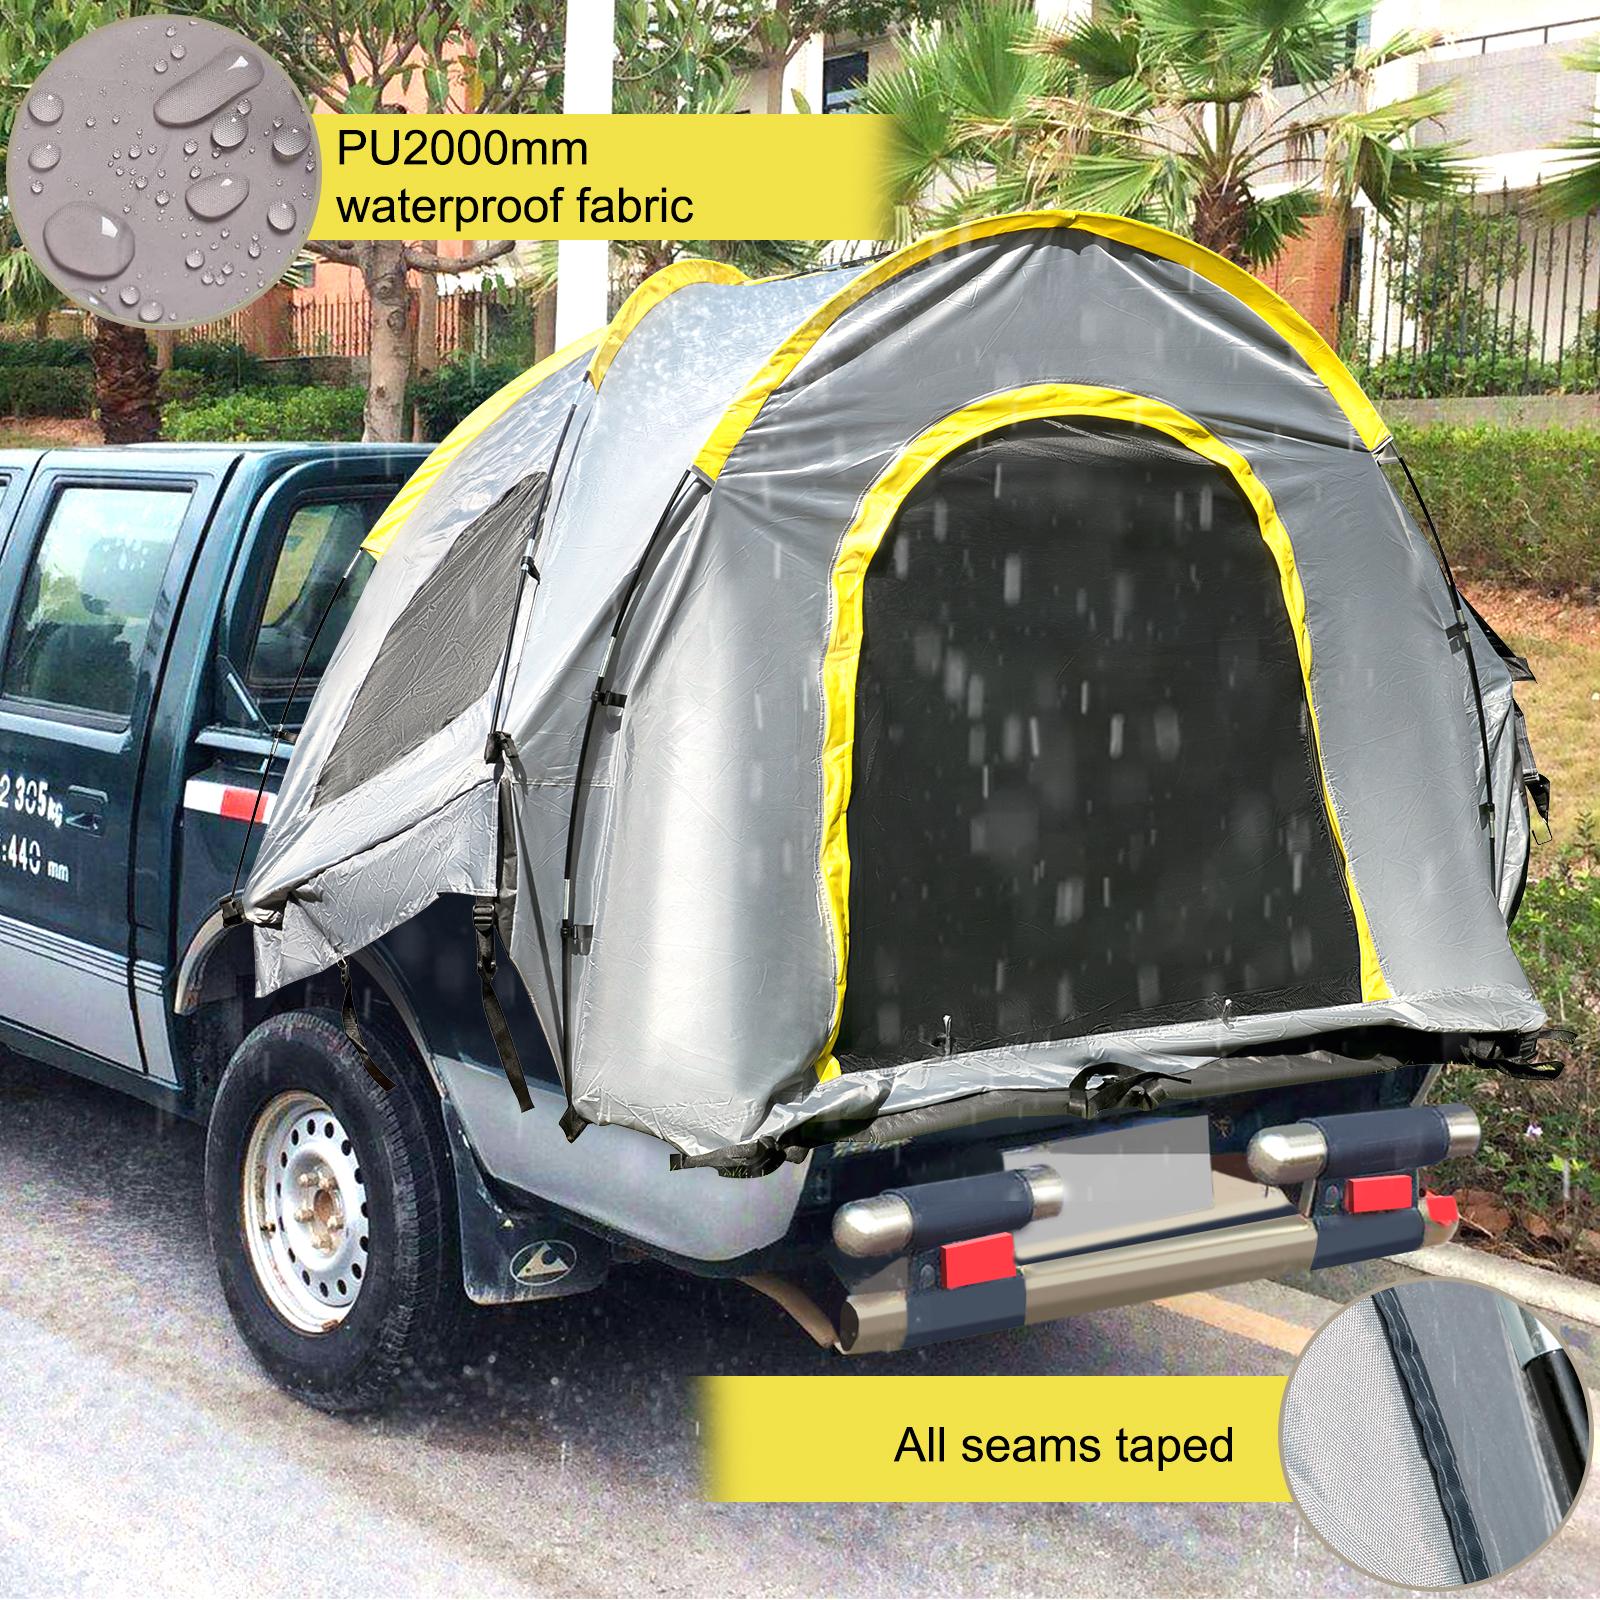 thumbnail 16 - VEVOR Truck Tent Truck Bed Tent 5' - 8' Pickup Tent Waterproof Outdoor Camping